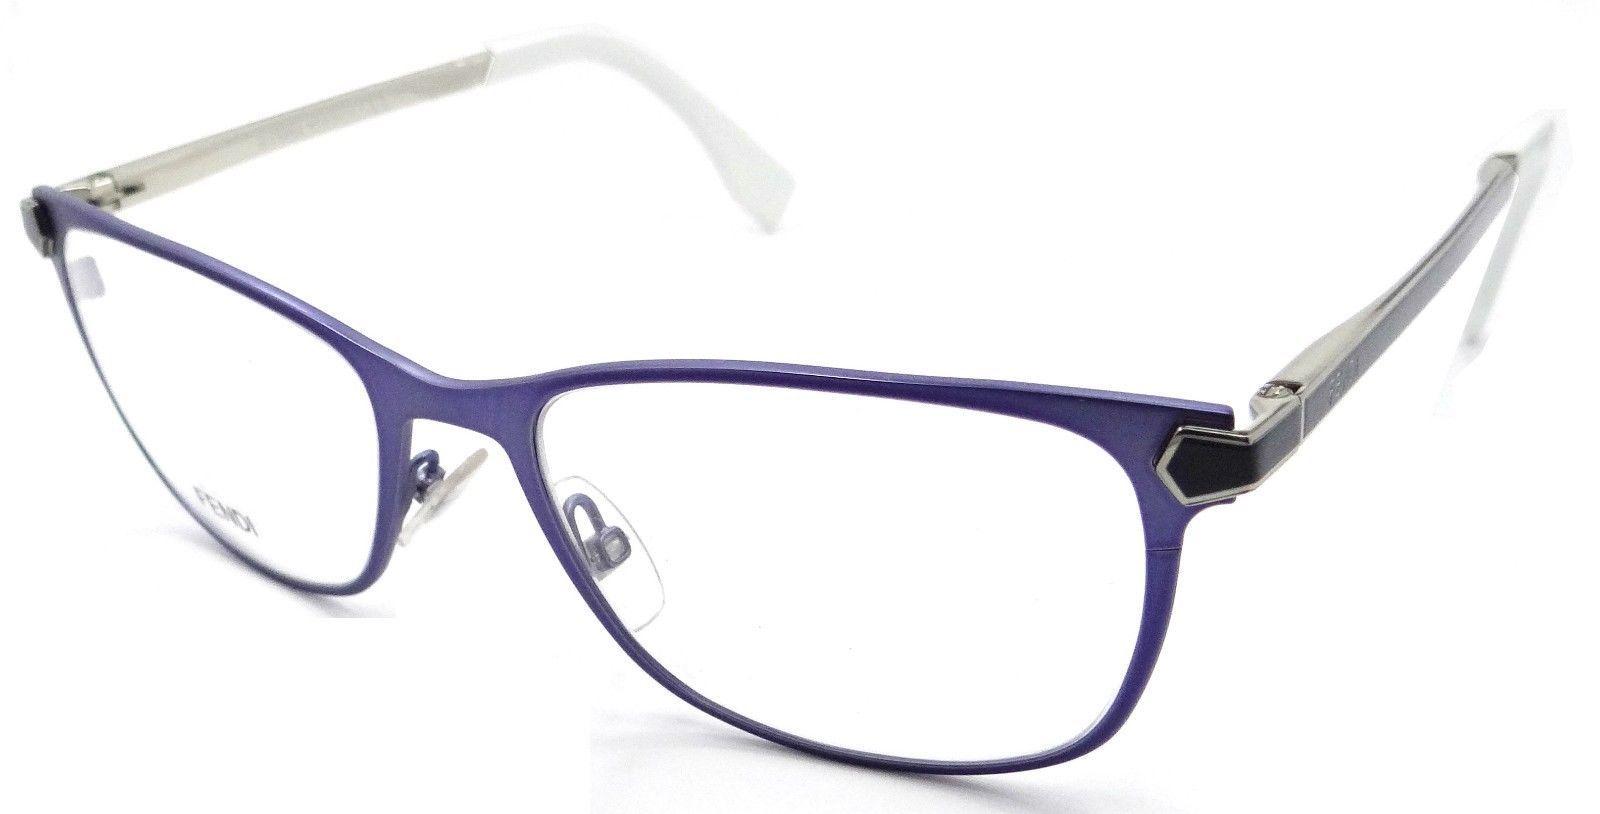 c7537d9b7a1 Fendi Rx Eyeglasses Frames FF 0036 XW9 and 50 similar items